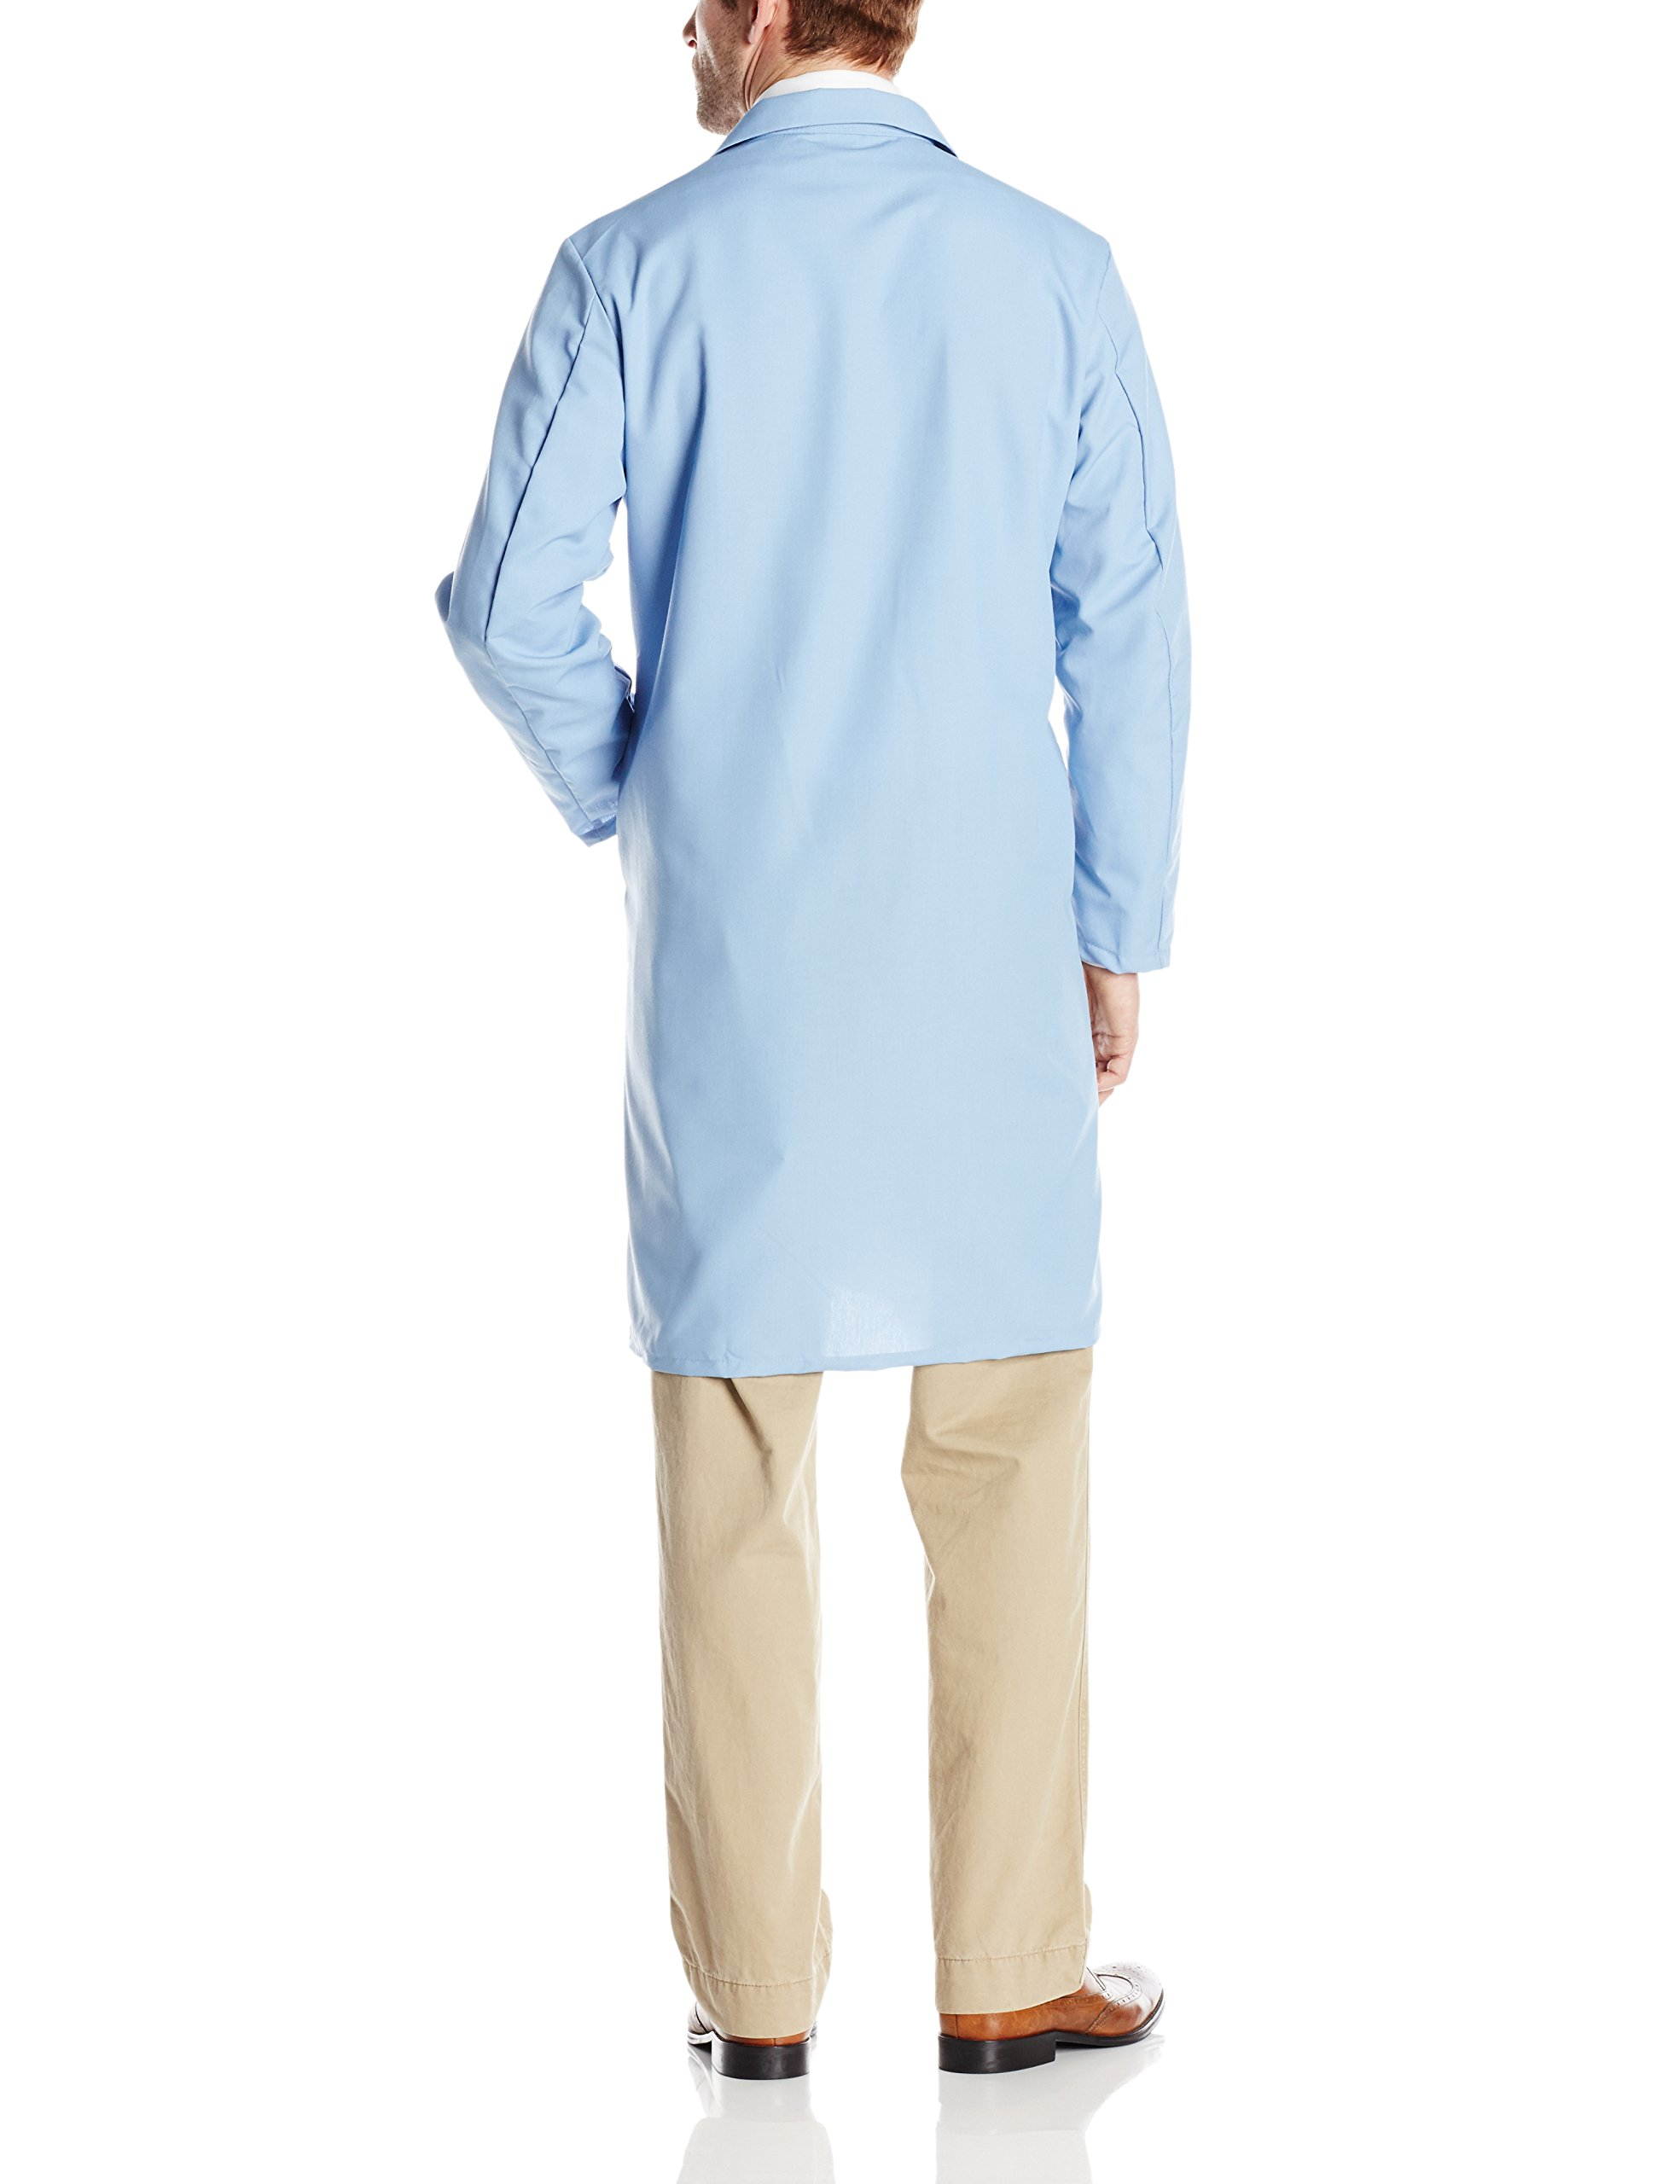 Red Kap Men's Lab Coat, Light Blue, Small by Red Kap (Image #2)